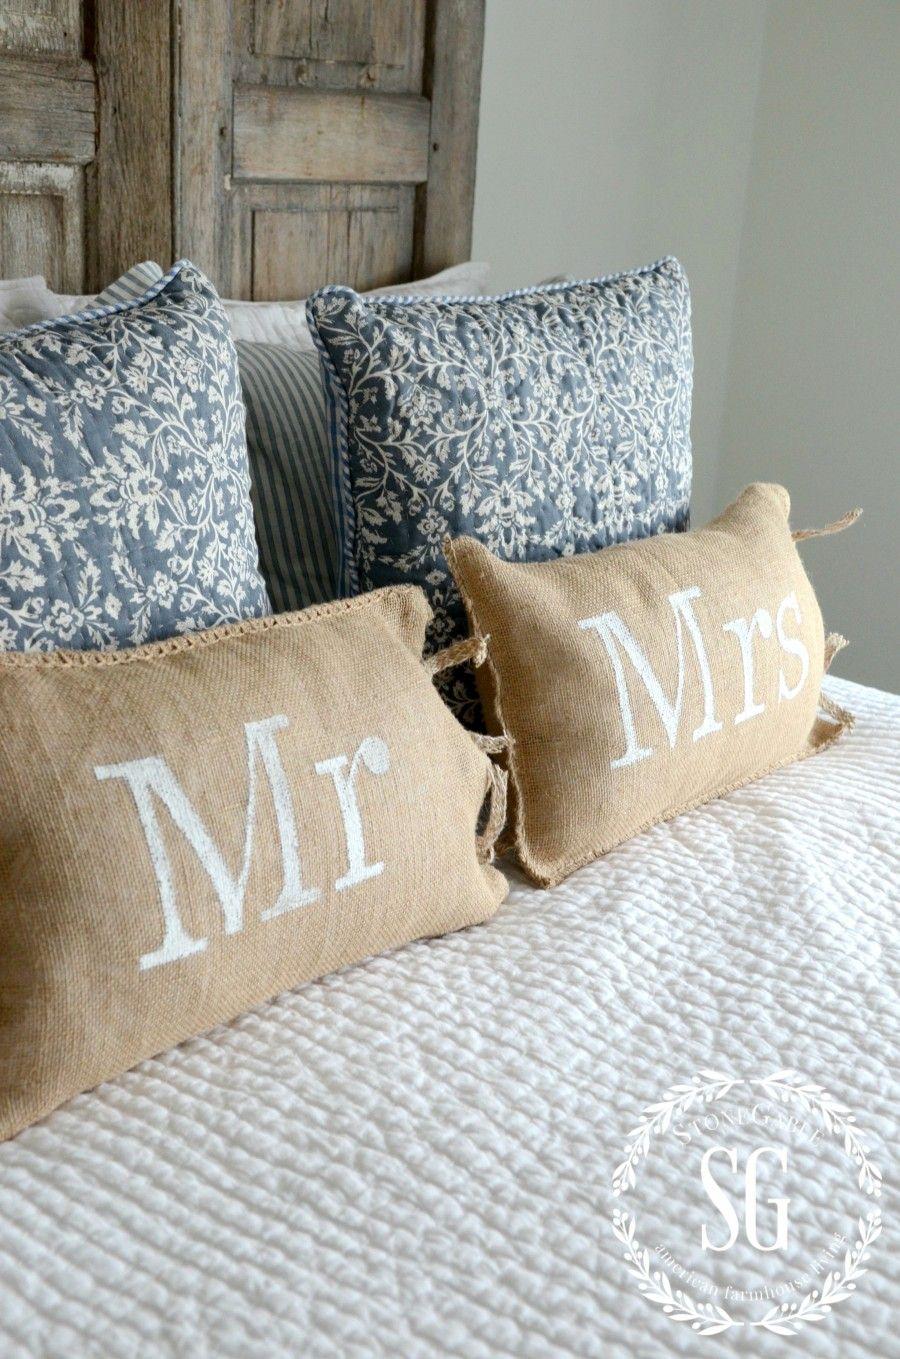 NO SEW MR AND MRS BURLAP PILLOWS & NO SEW MR AND MRS BURLAP PILLOWS | Burlap pillows and Burlap pillowsntoast.com